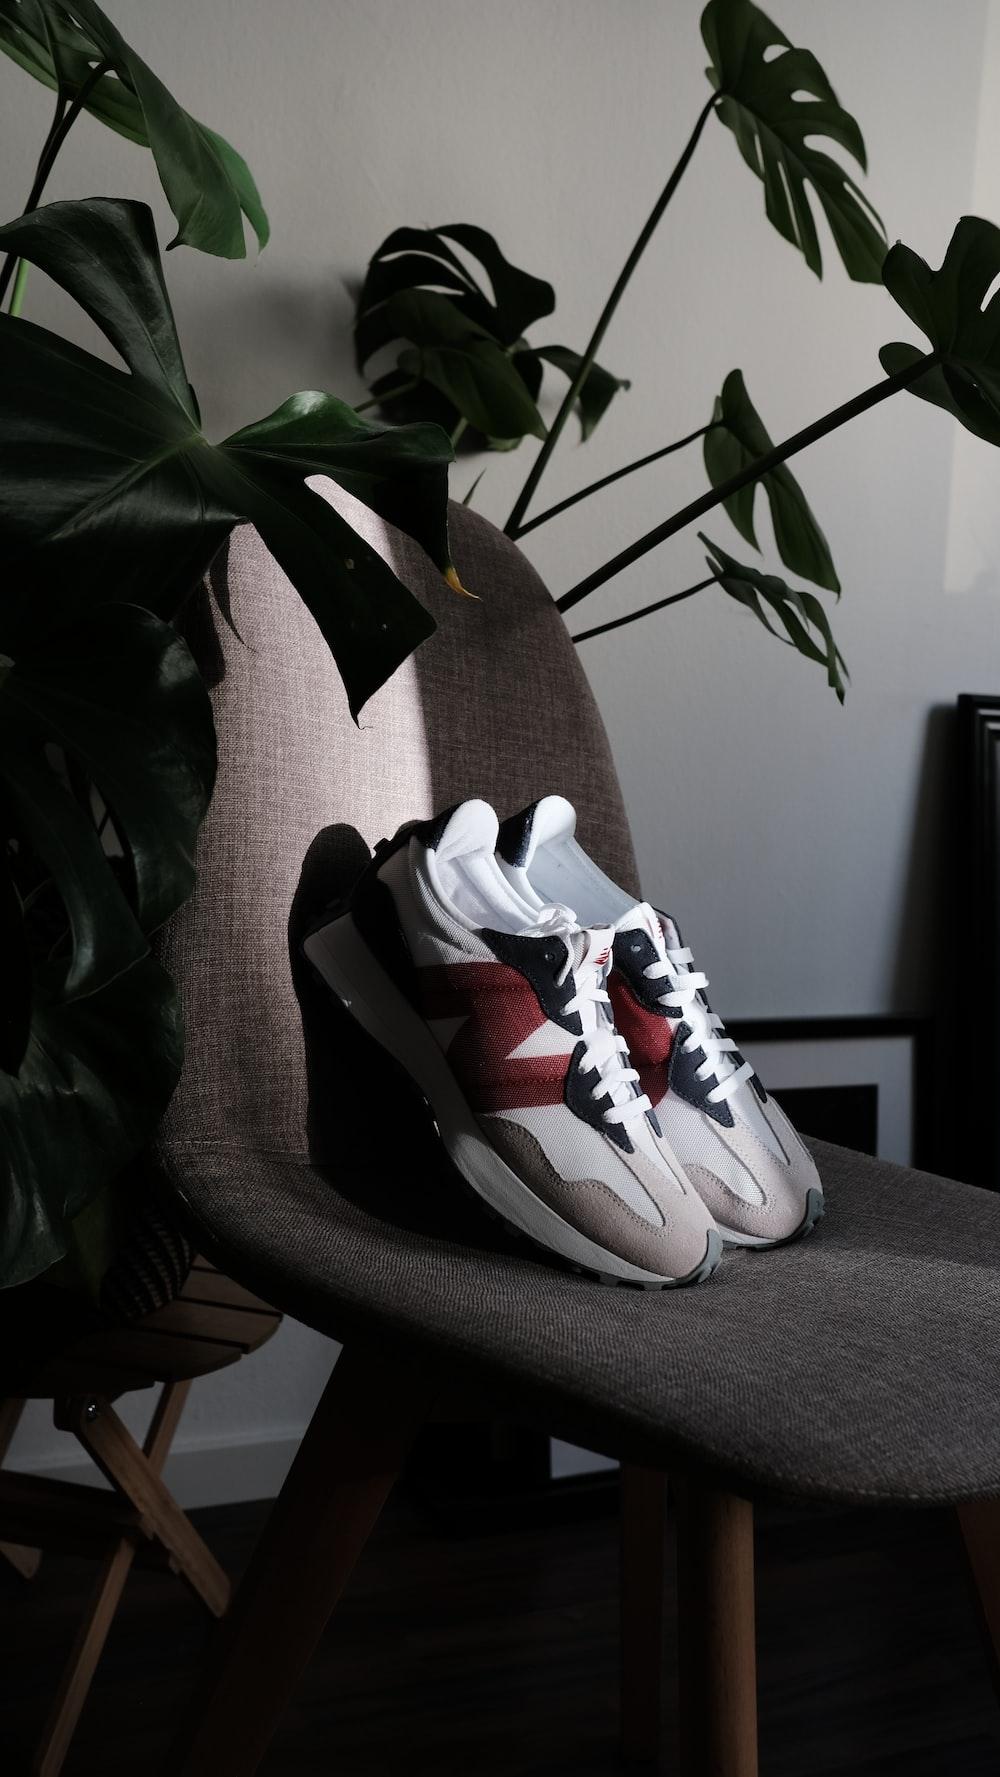 white and black nike basketball shoes